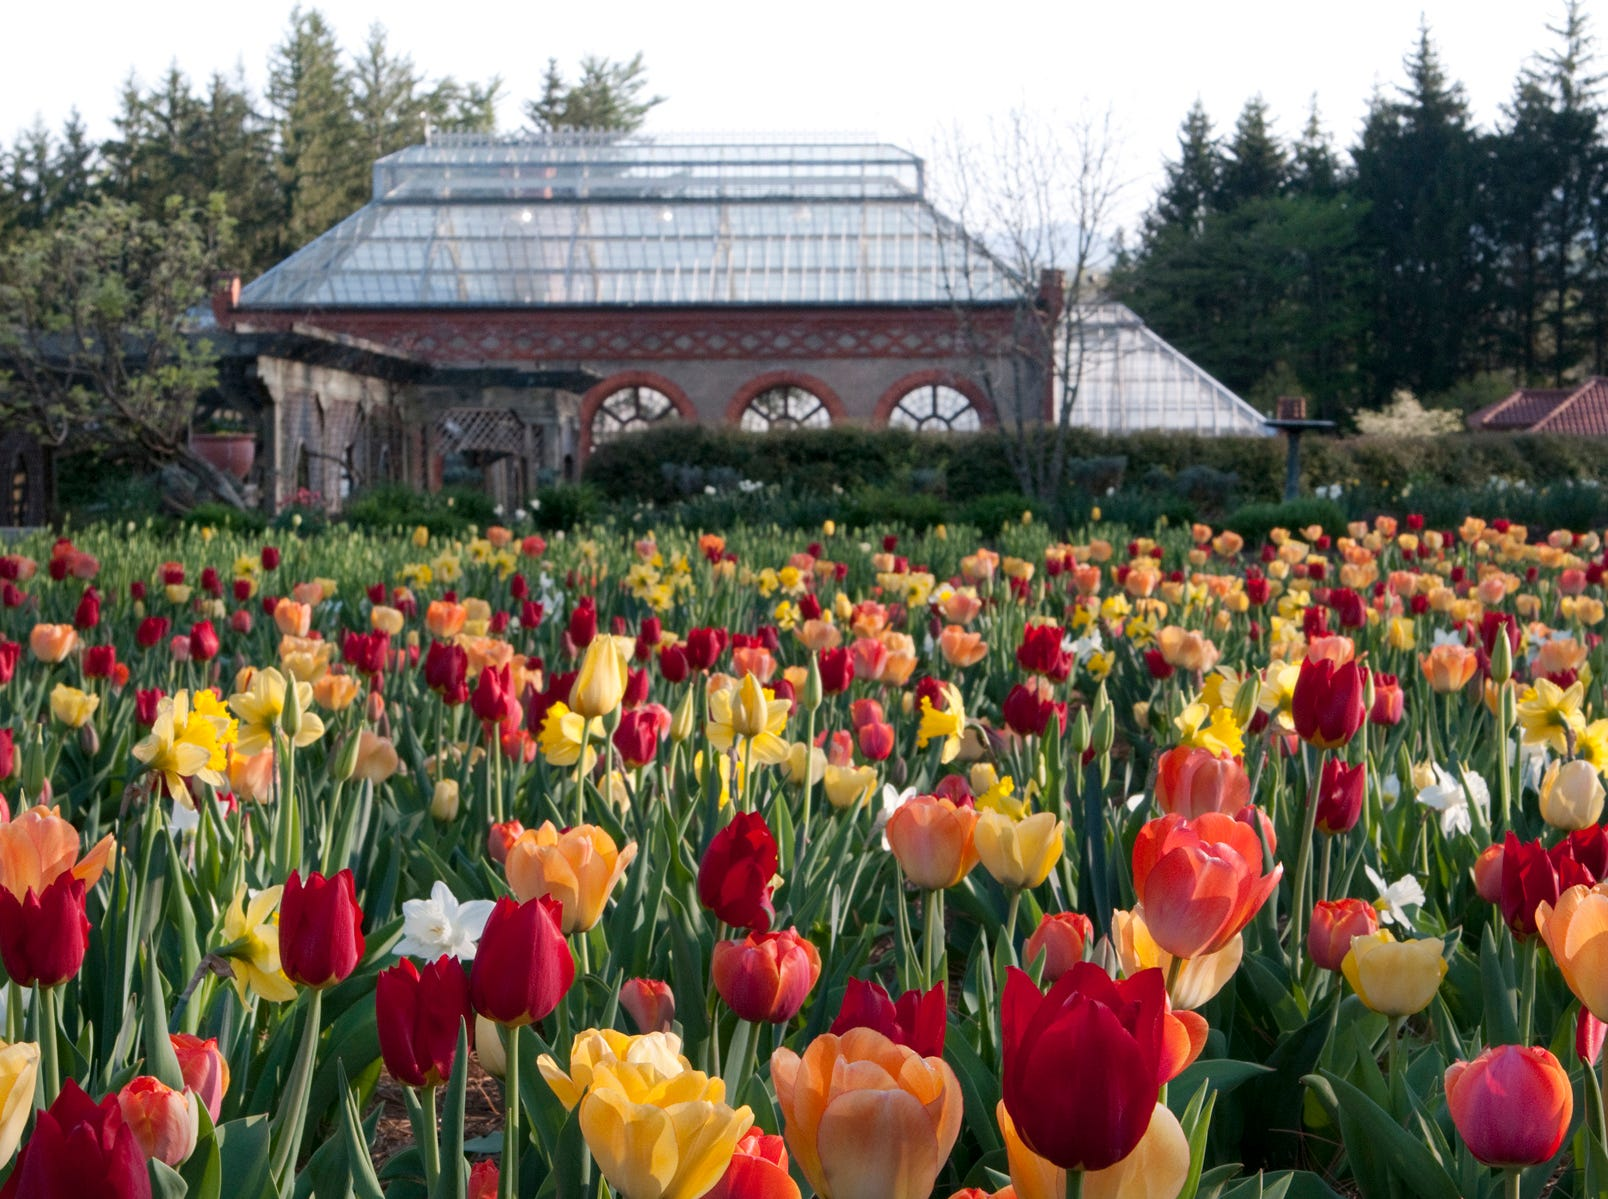 Biltmore's annual spring celebration, Biltmore Blooms, runs through May 23, 2019.